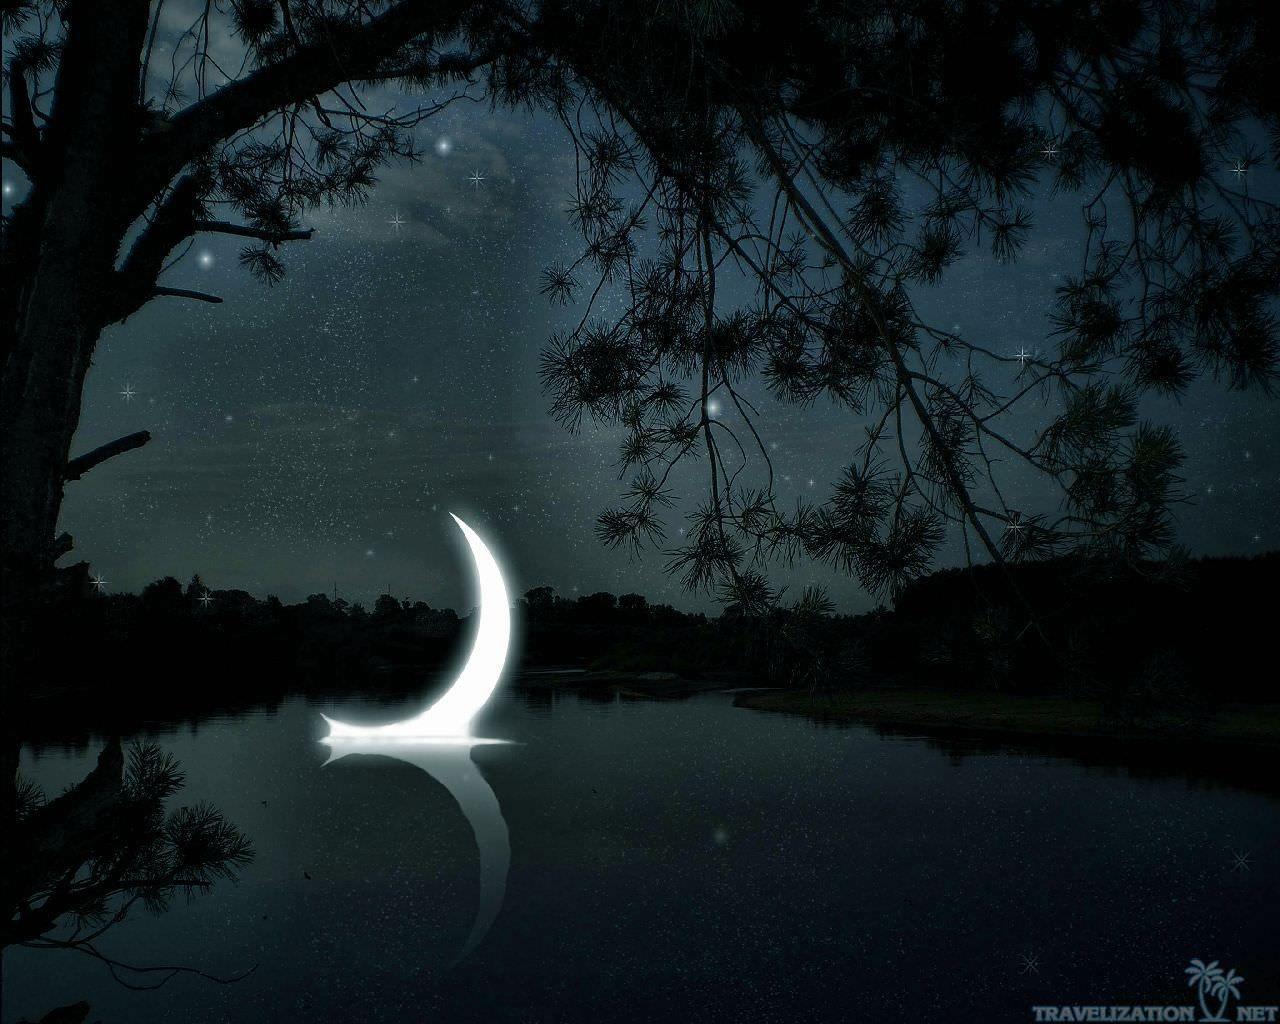 crescentmoonwallpaper hdwallpapers Moon, Island